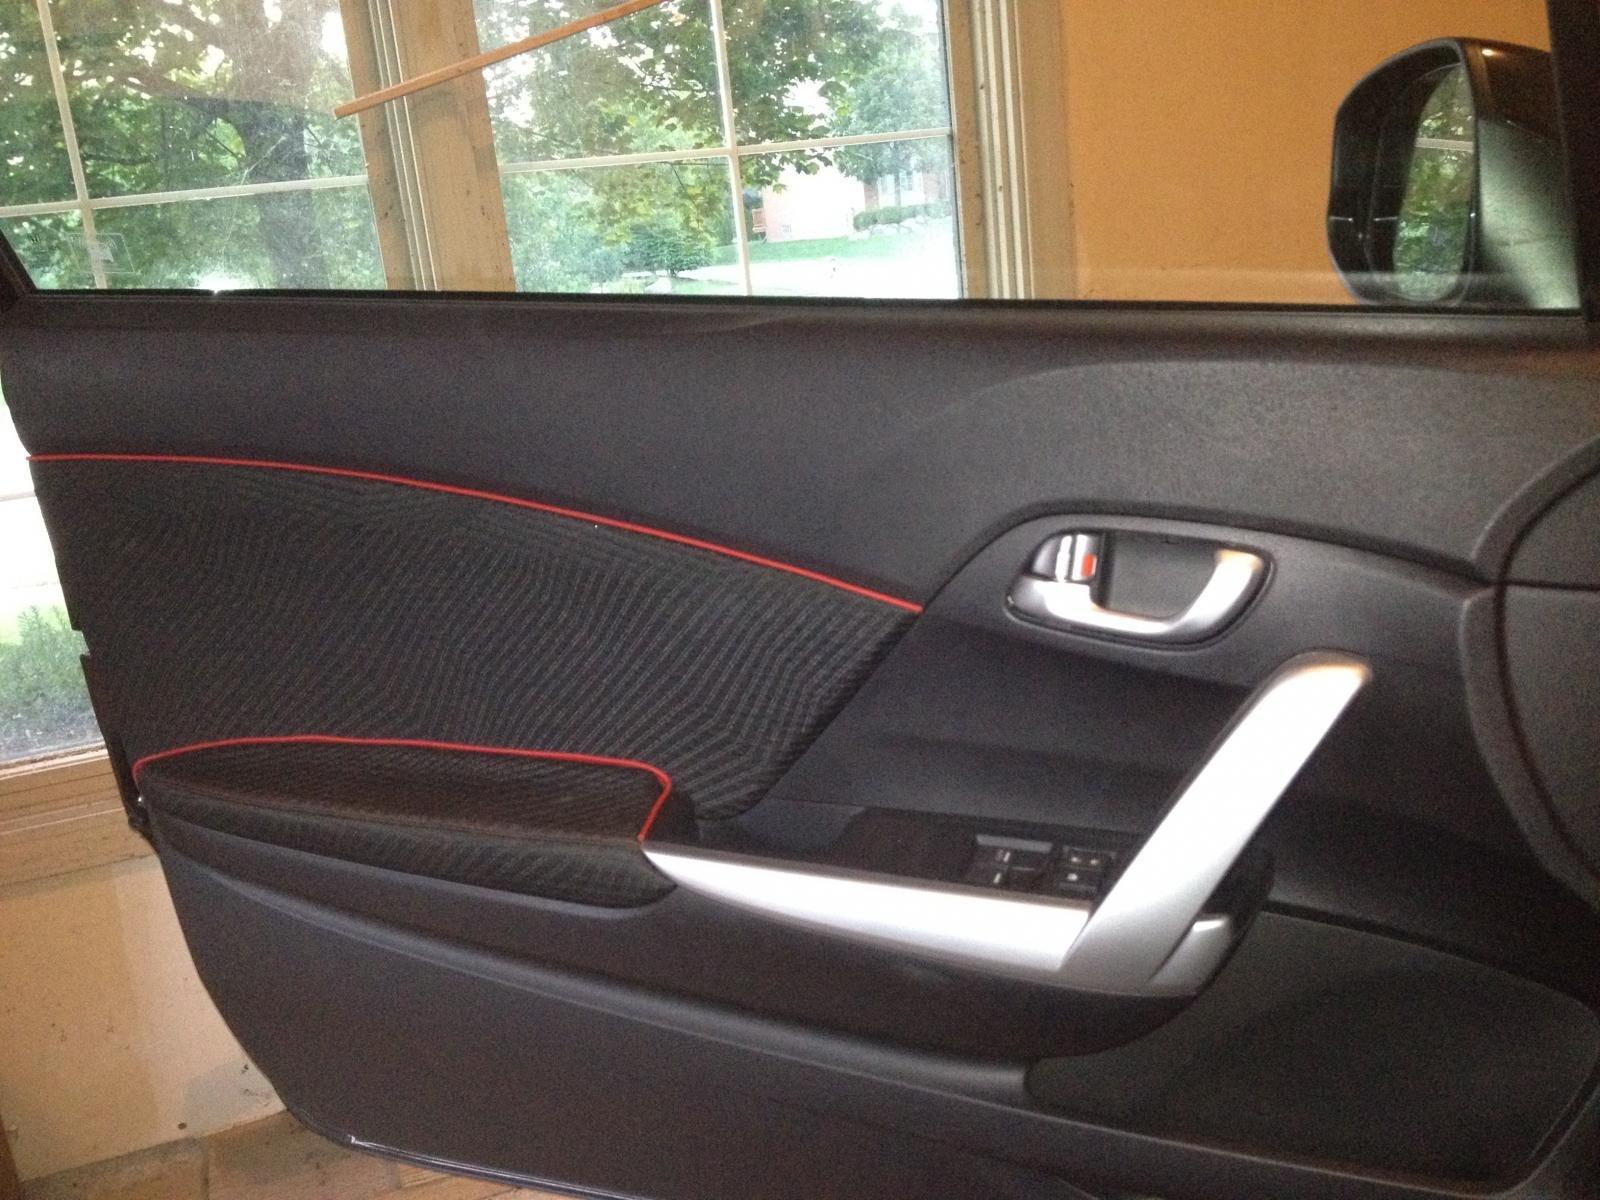 Car interior piping - Interior Door Piping Welt Trimming Img_0467 Jpg